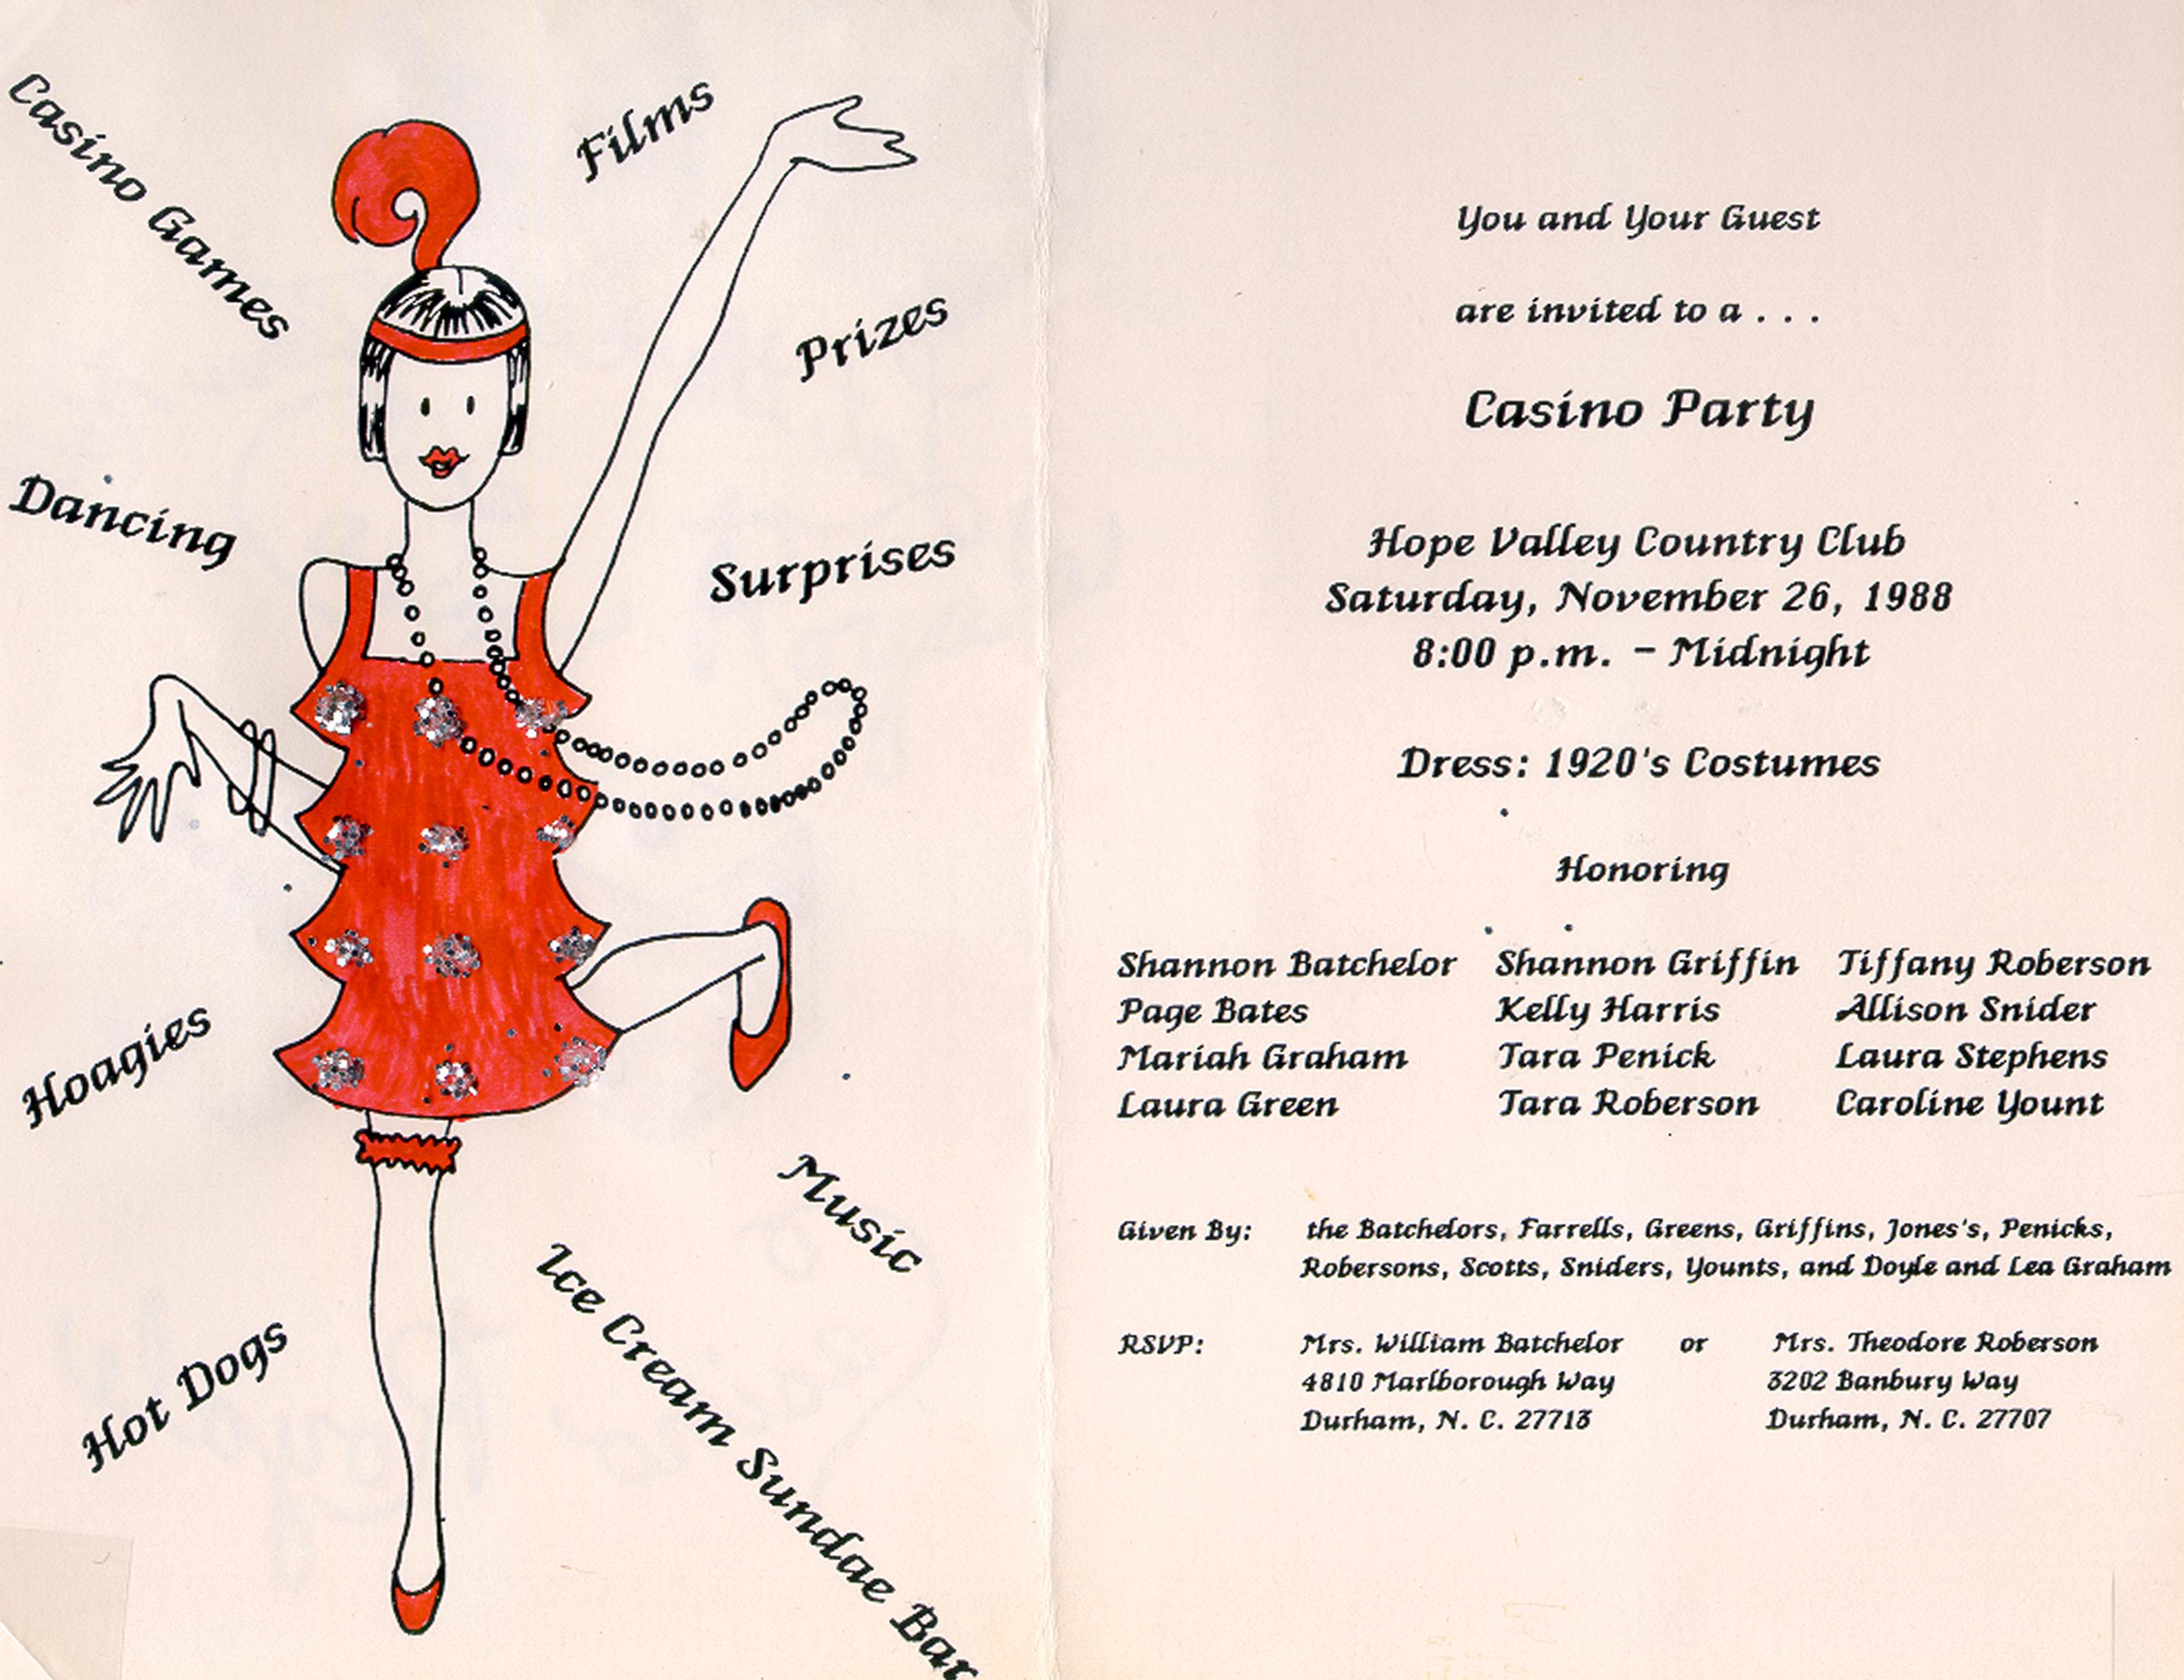 Debutante Ball Society of Durham Inc Records 19512009